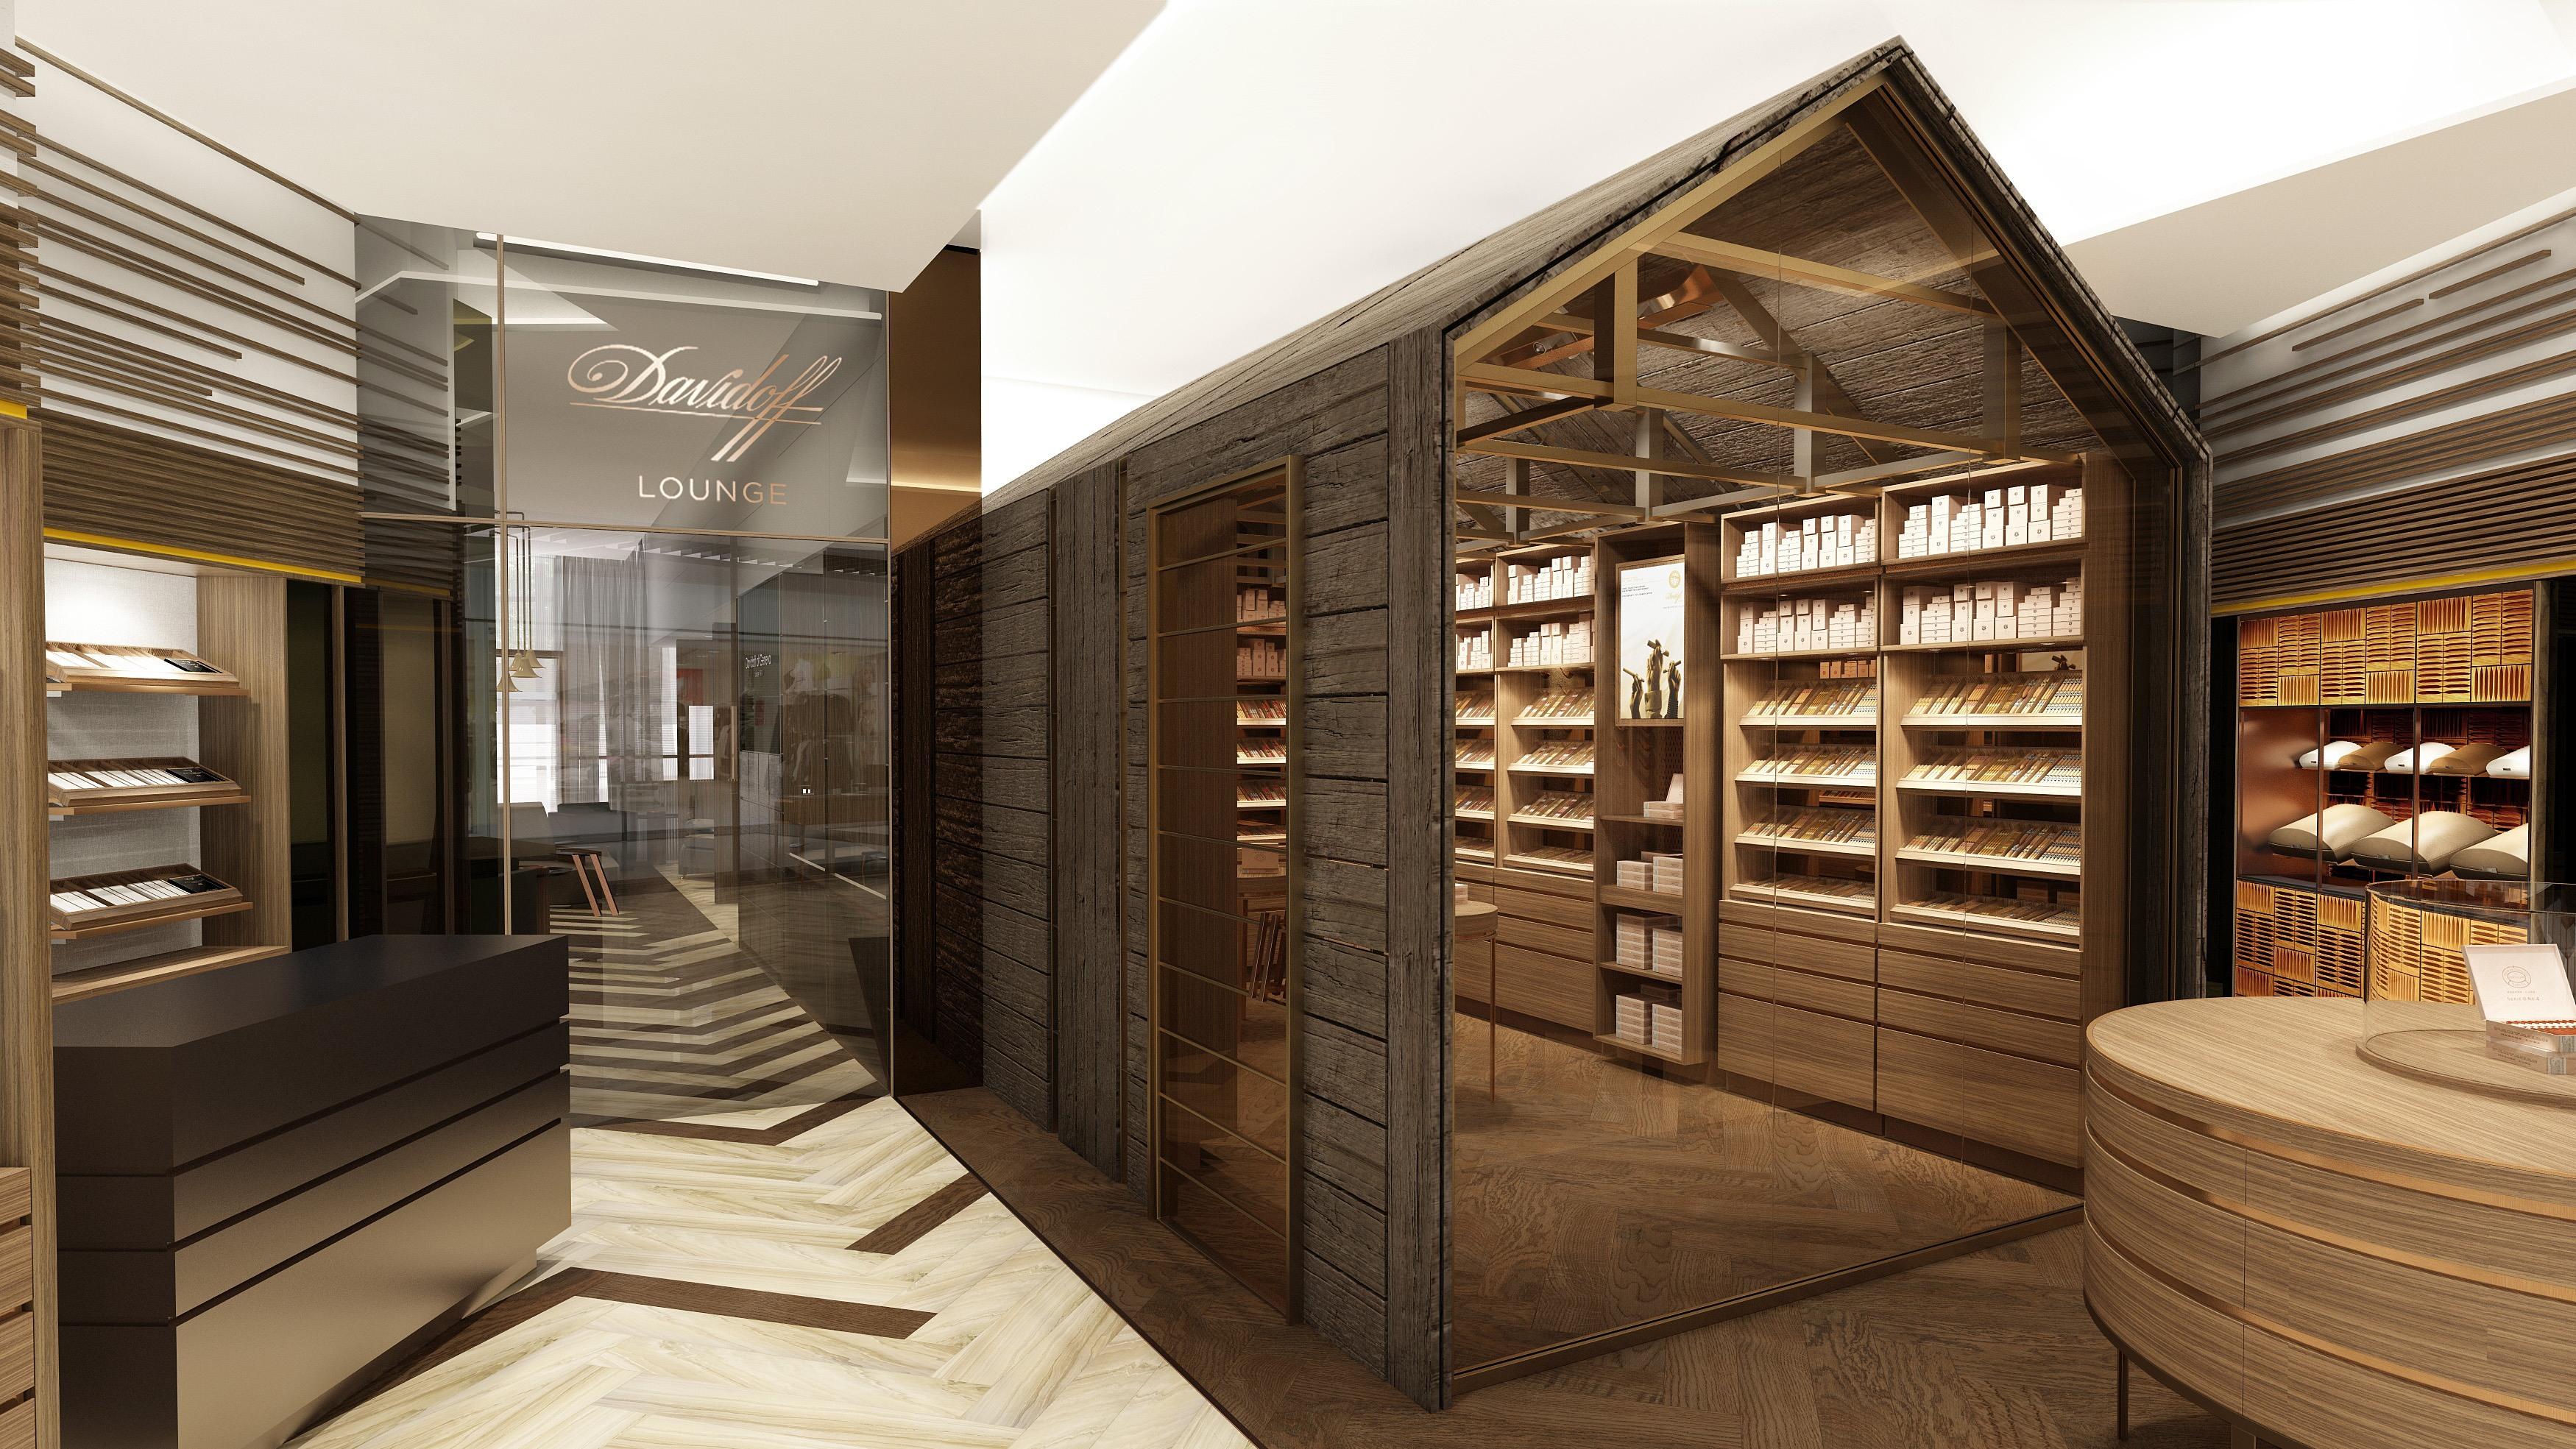 Modern Home Bar Design Layout Davidoff S Newest Flagship Store Coming To Lower Manhattan